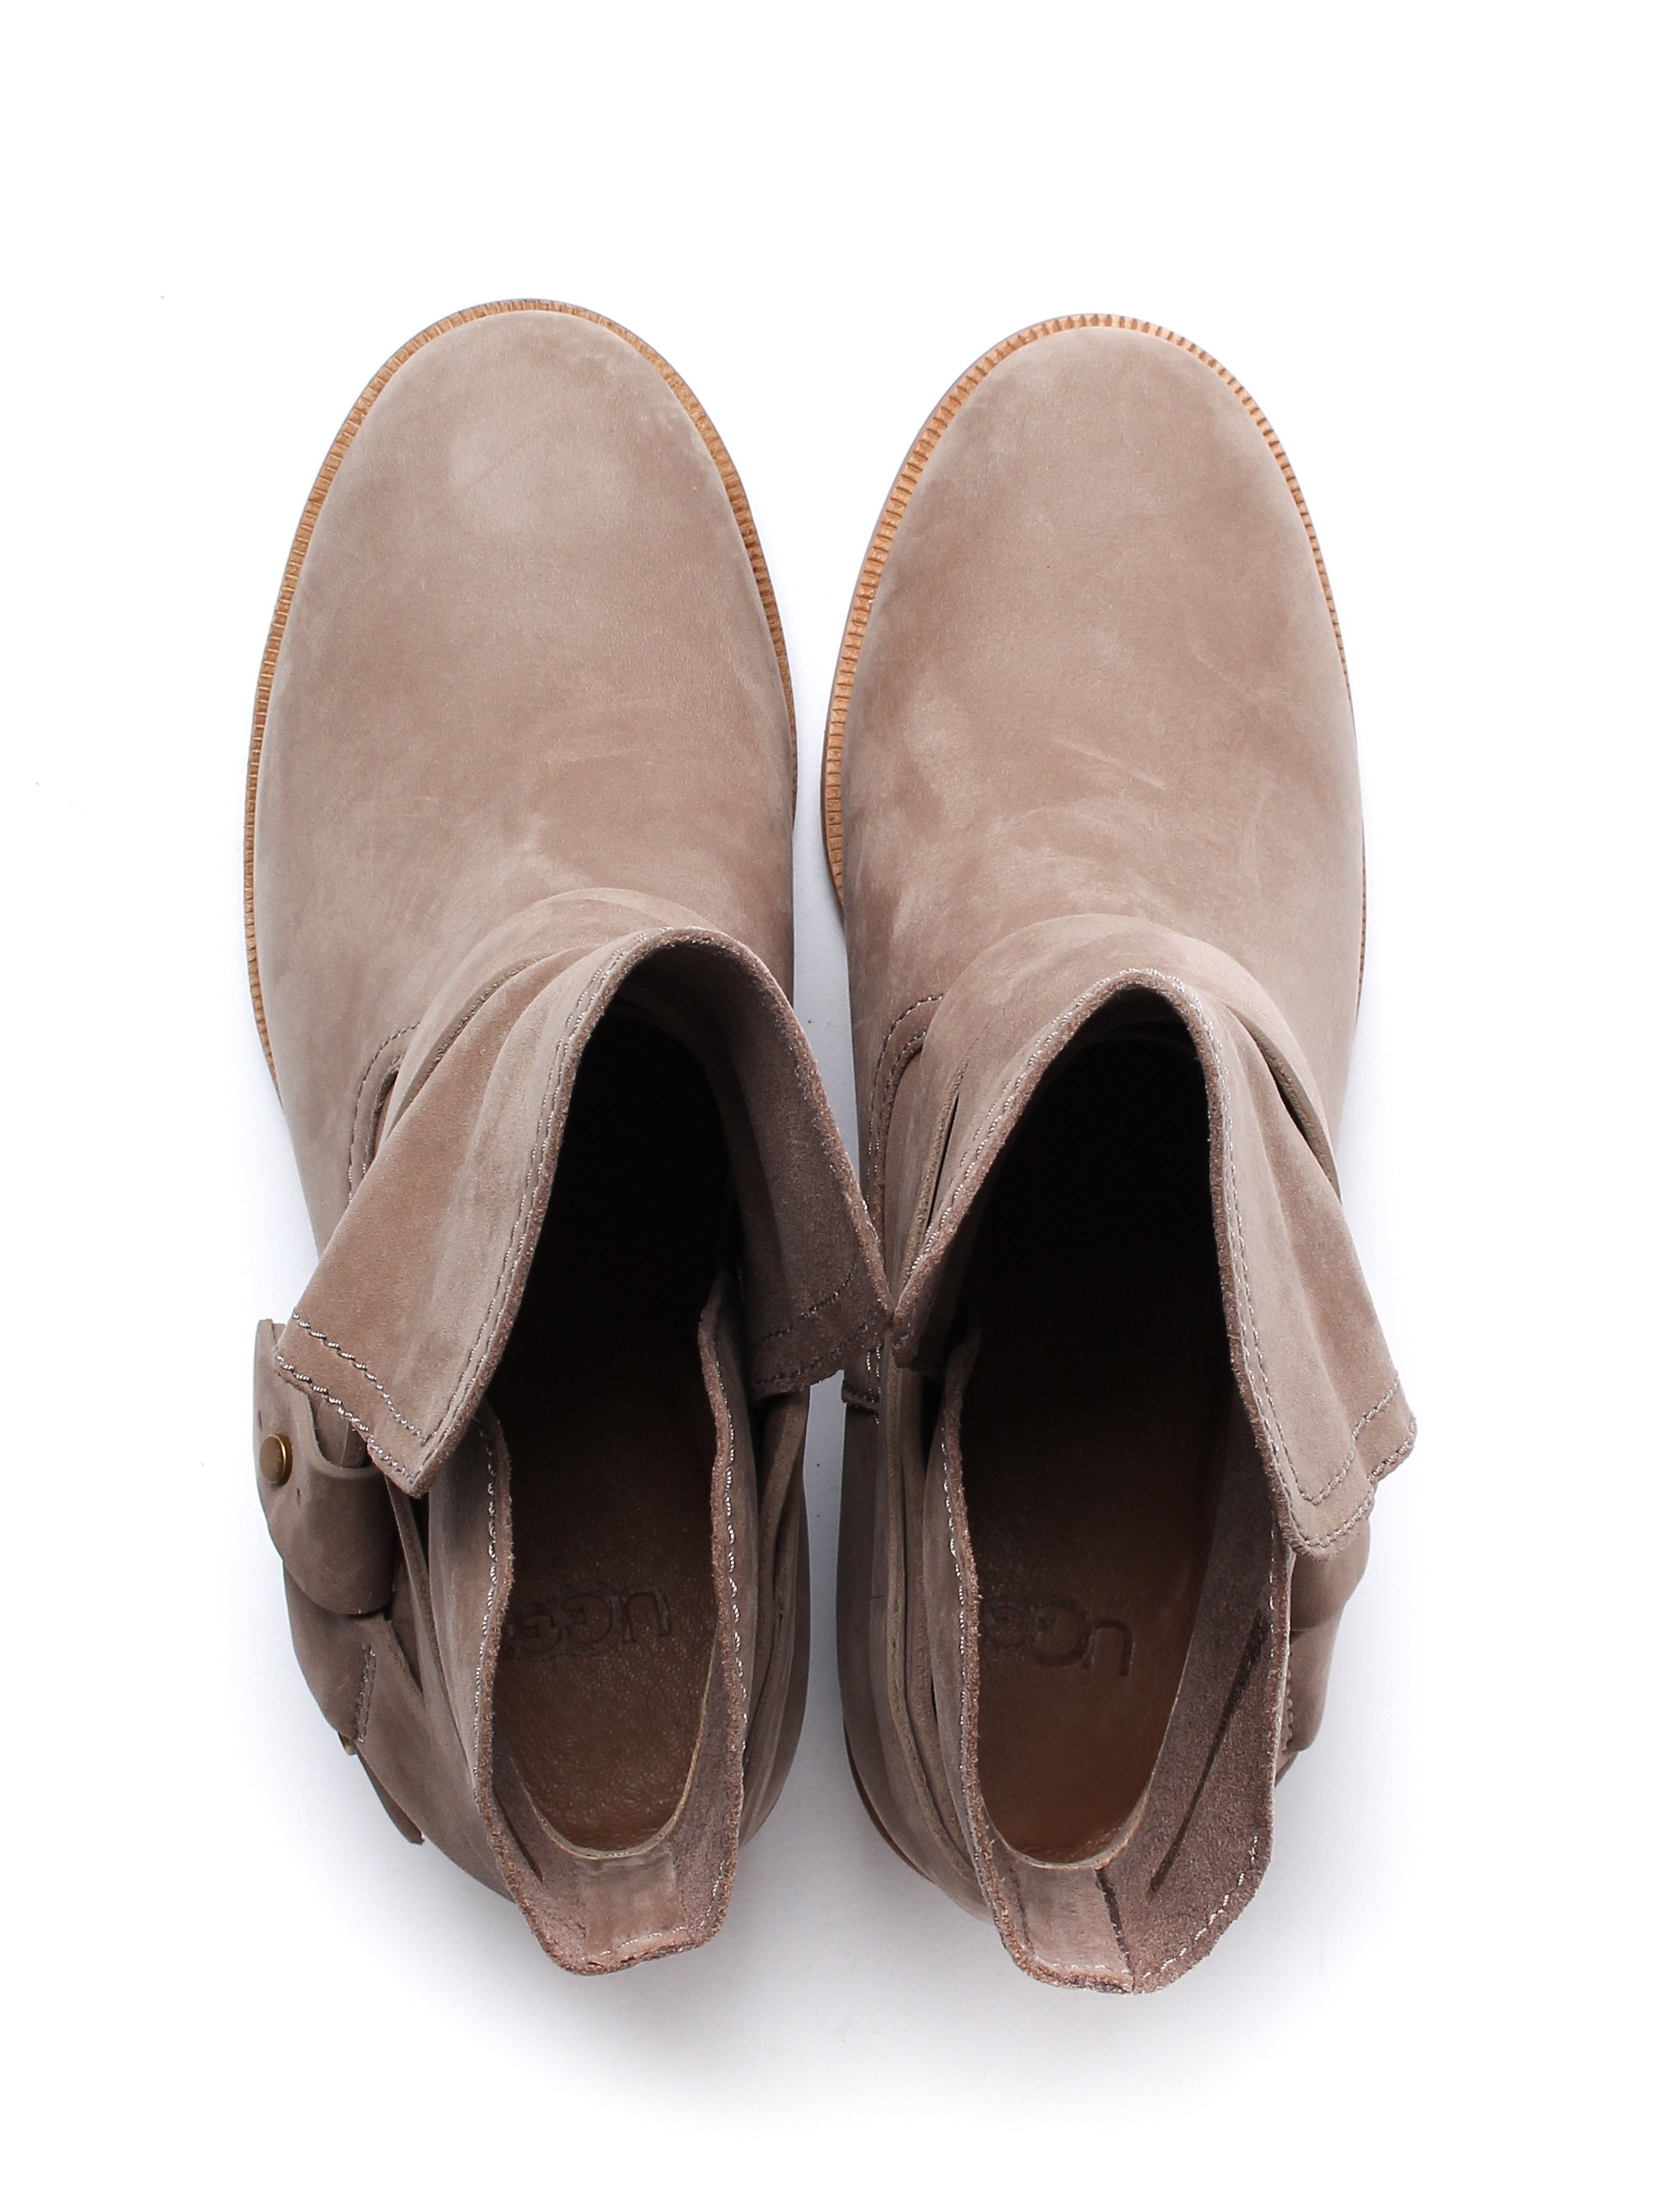 UGG Women's Elora Ankle Boots - Sahara Nubuck